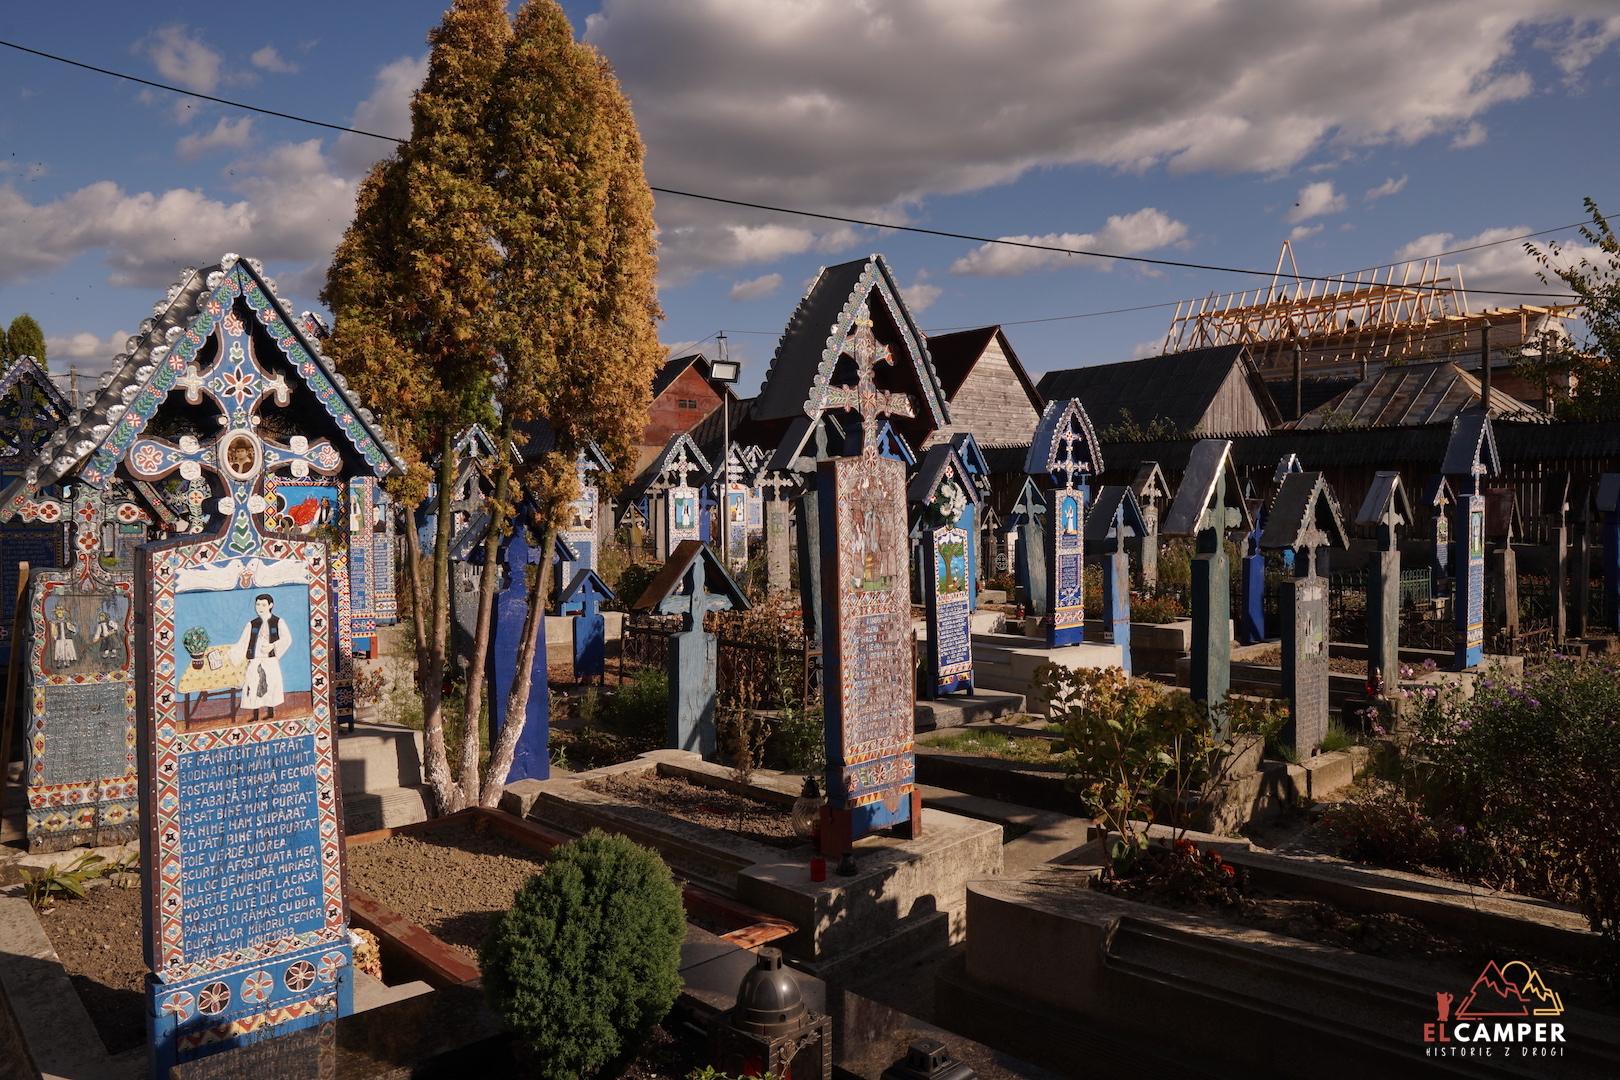 kamper budowa kampera Rumunia Wesoły cmentarz campervan life box truck